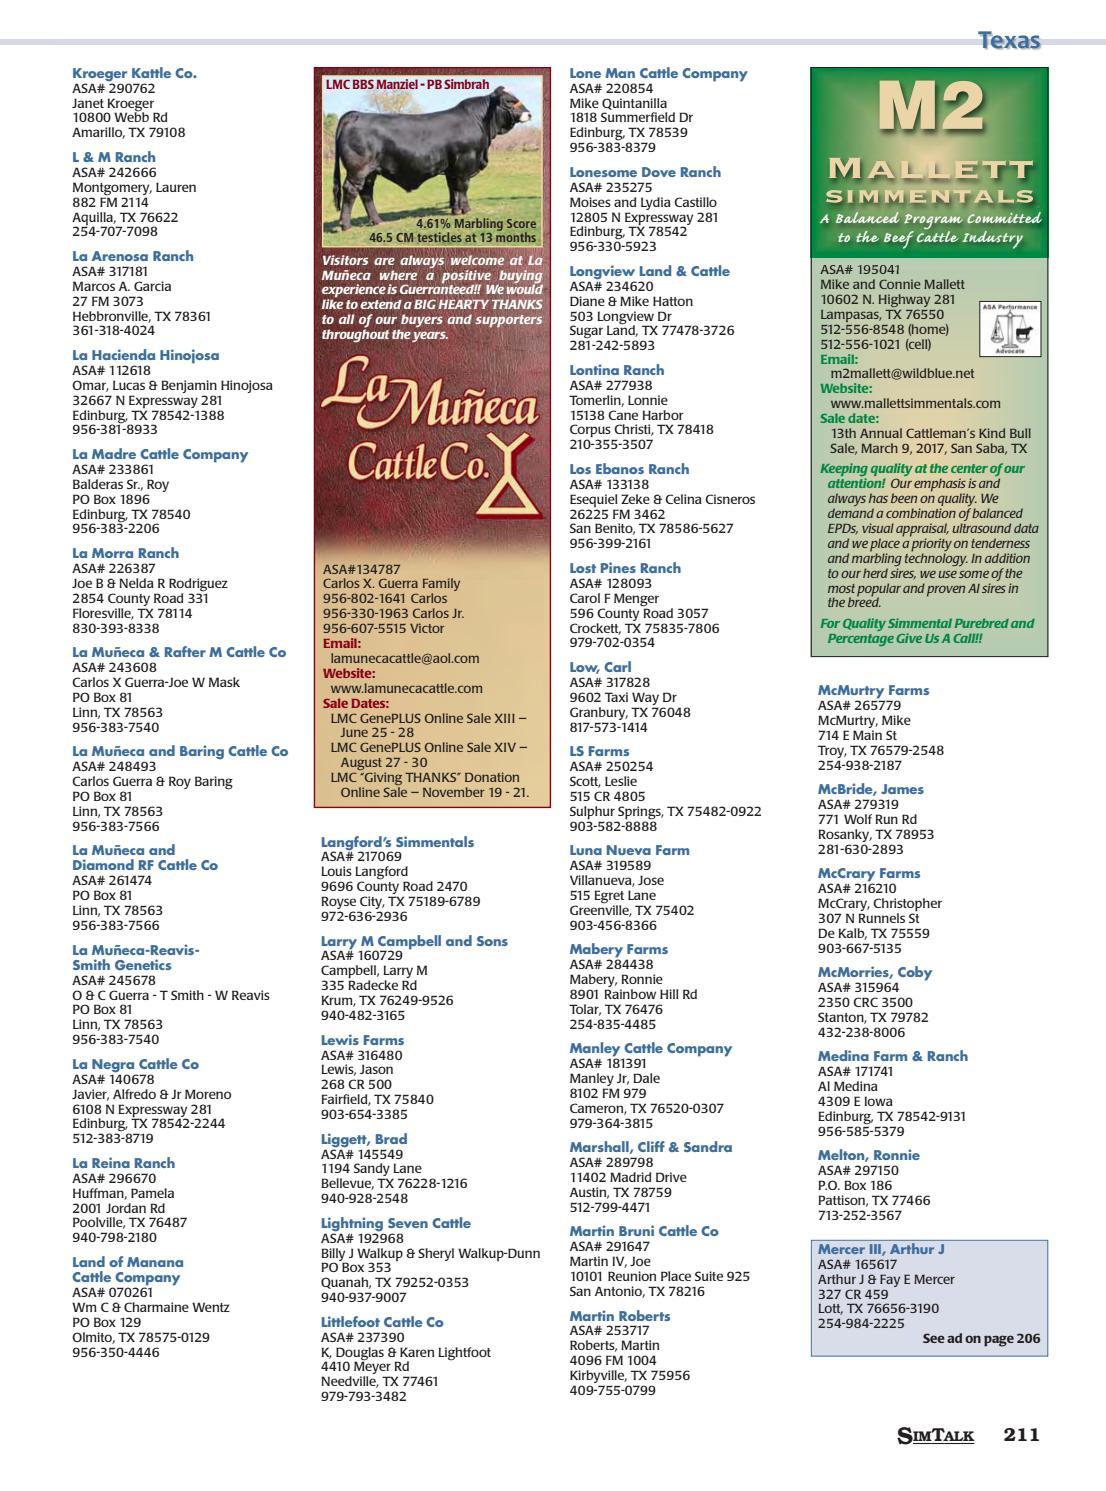 SimTalk 2016 Membership Directory By American Simmental Publication Inc